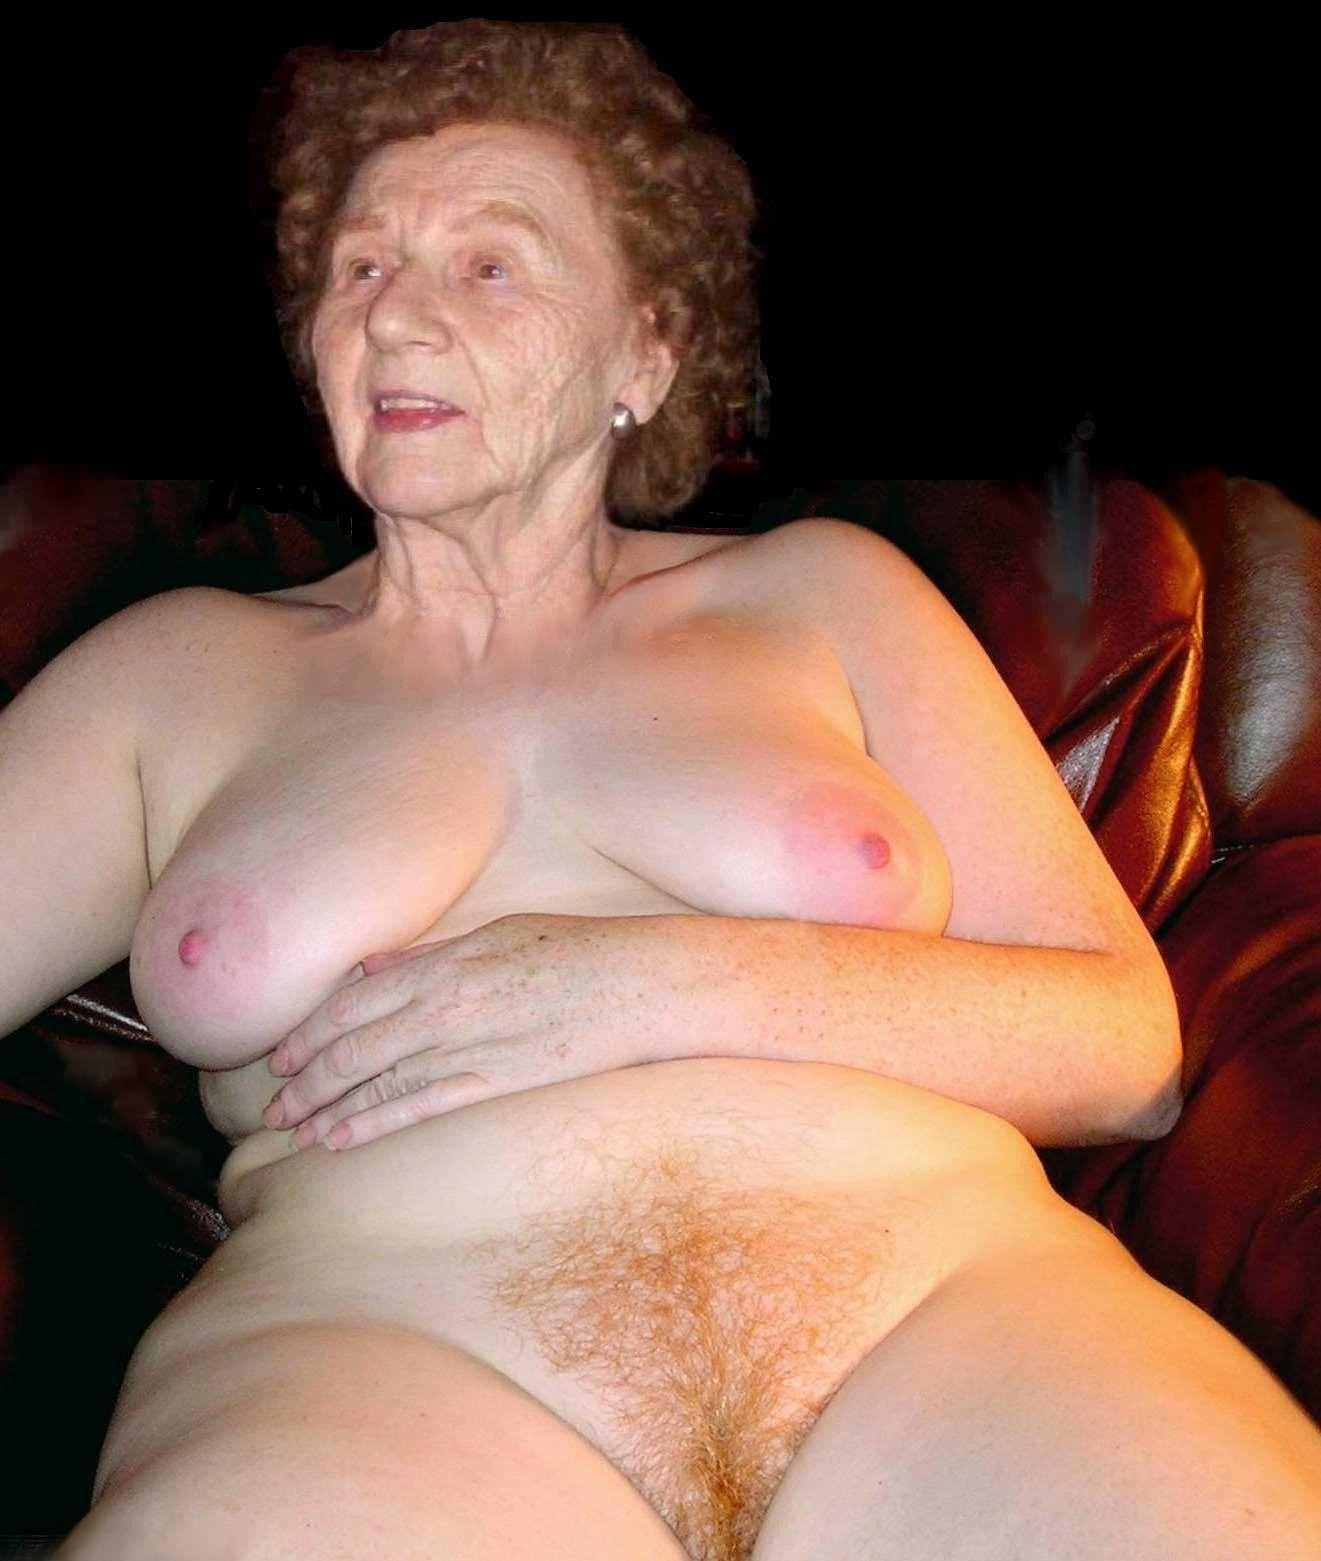 Older lady nude pics